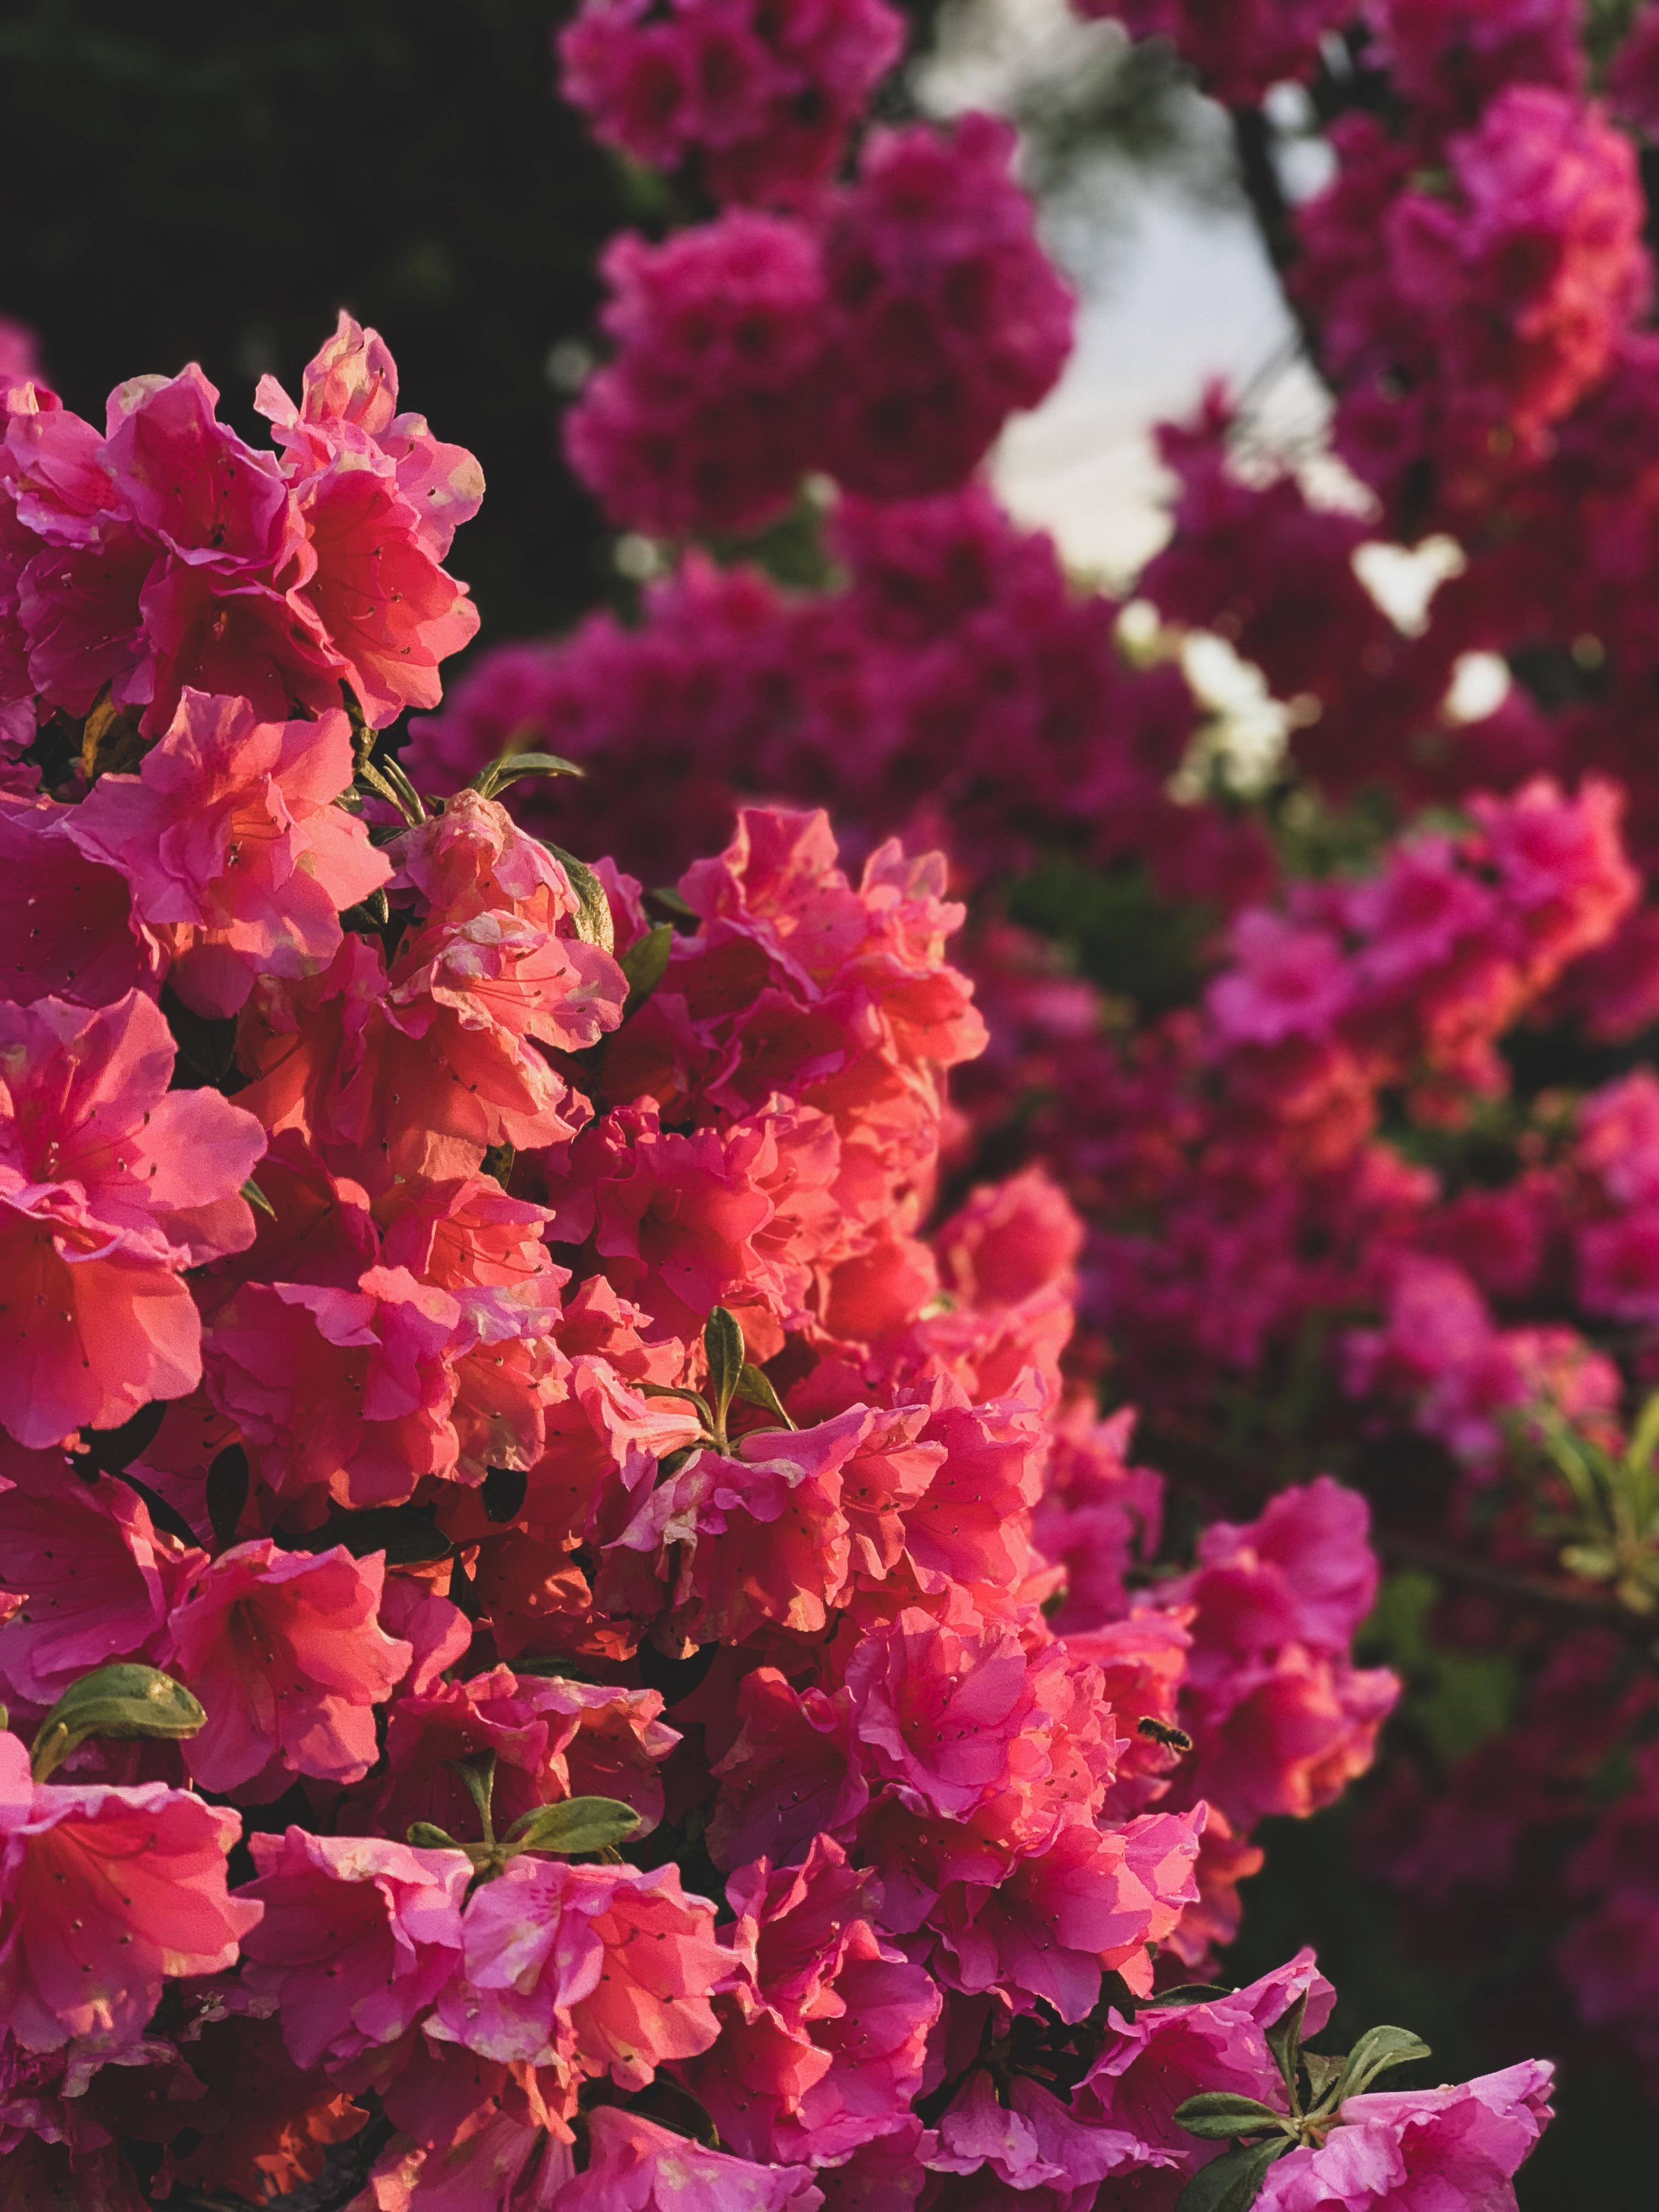 Iphone Aesthetic Flower Single Flower Wallpaper Hd